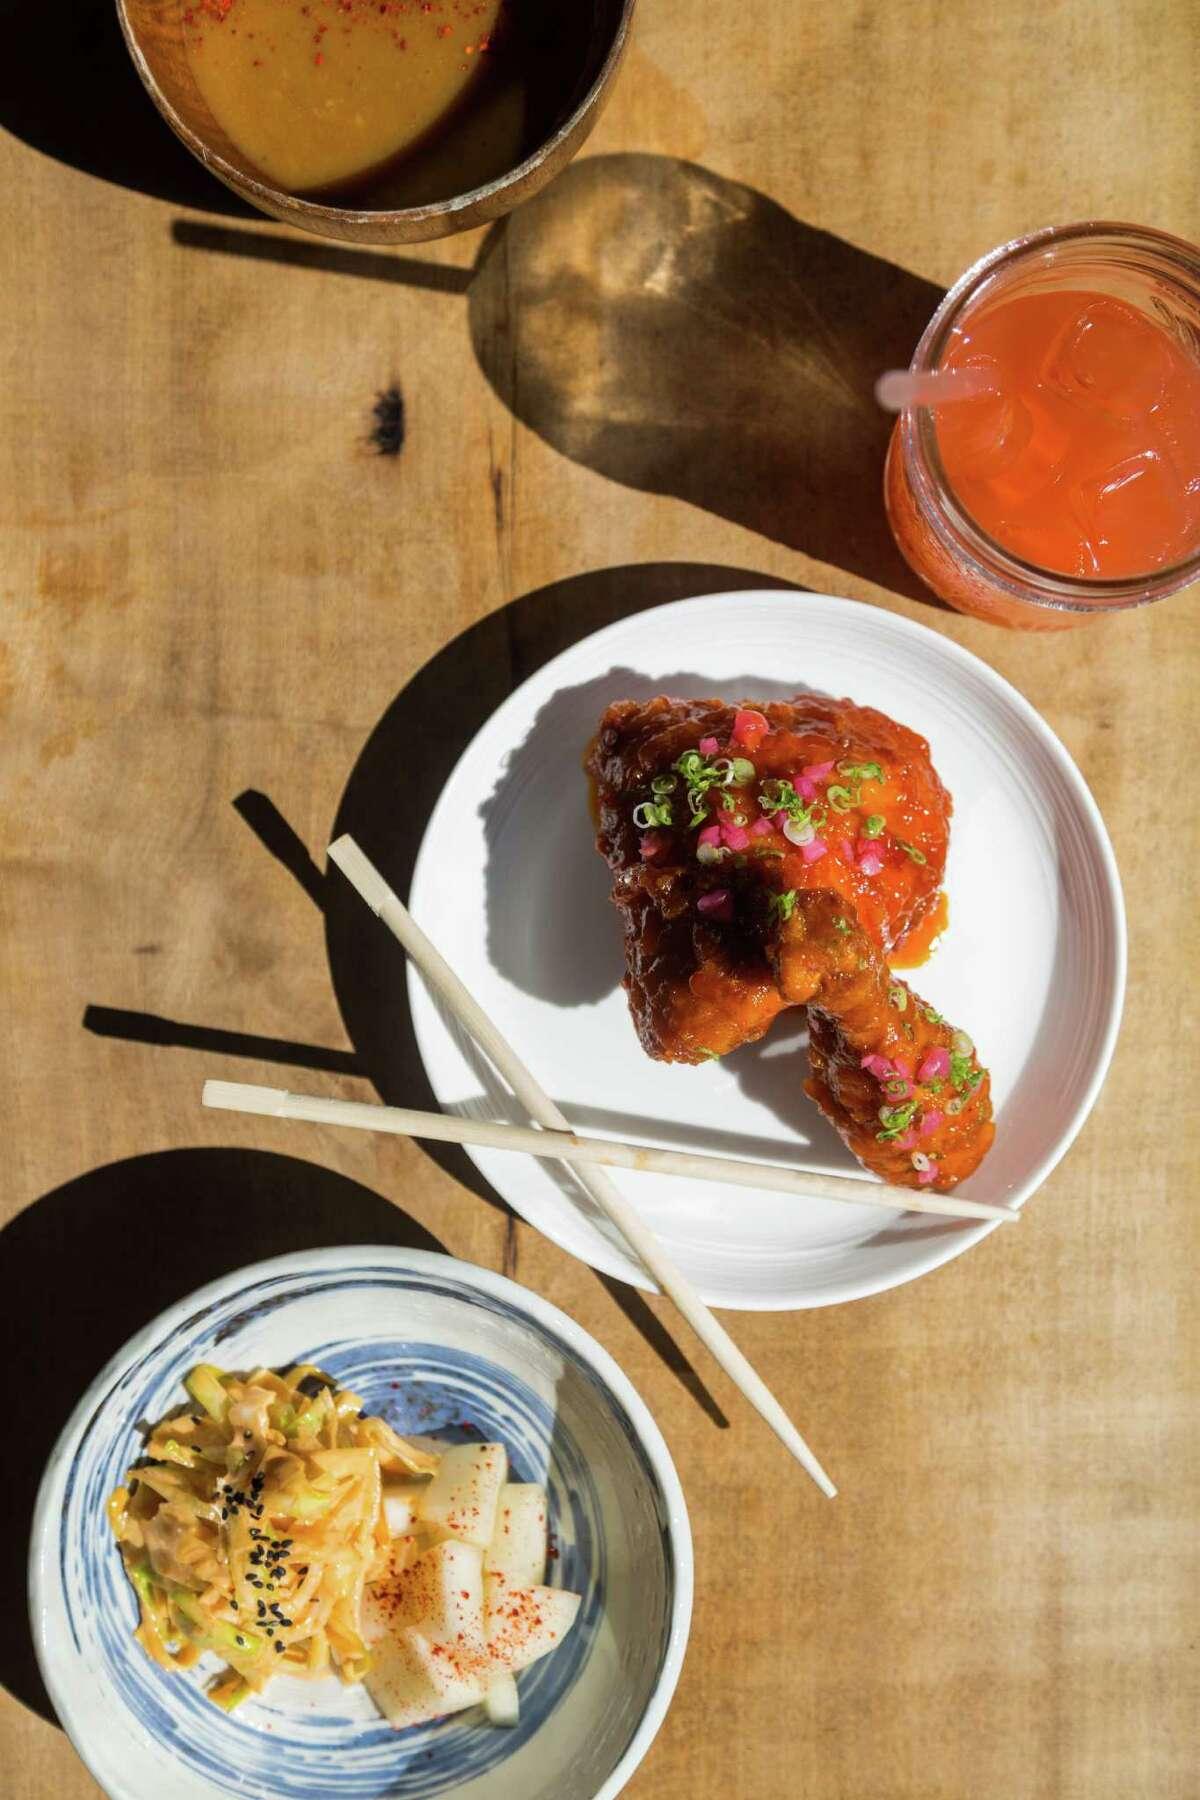 Korean fried chicken with spicy slaw, pickled daikon and dash gravy at Namu Gaji in San Francisco.